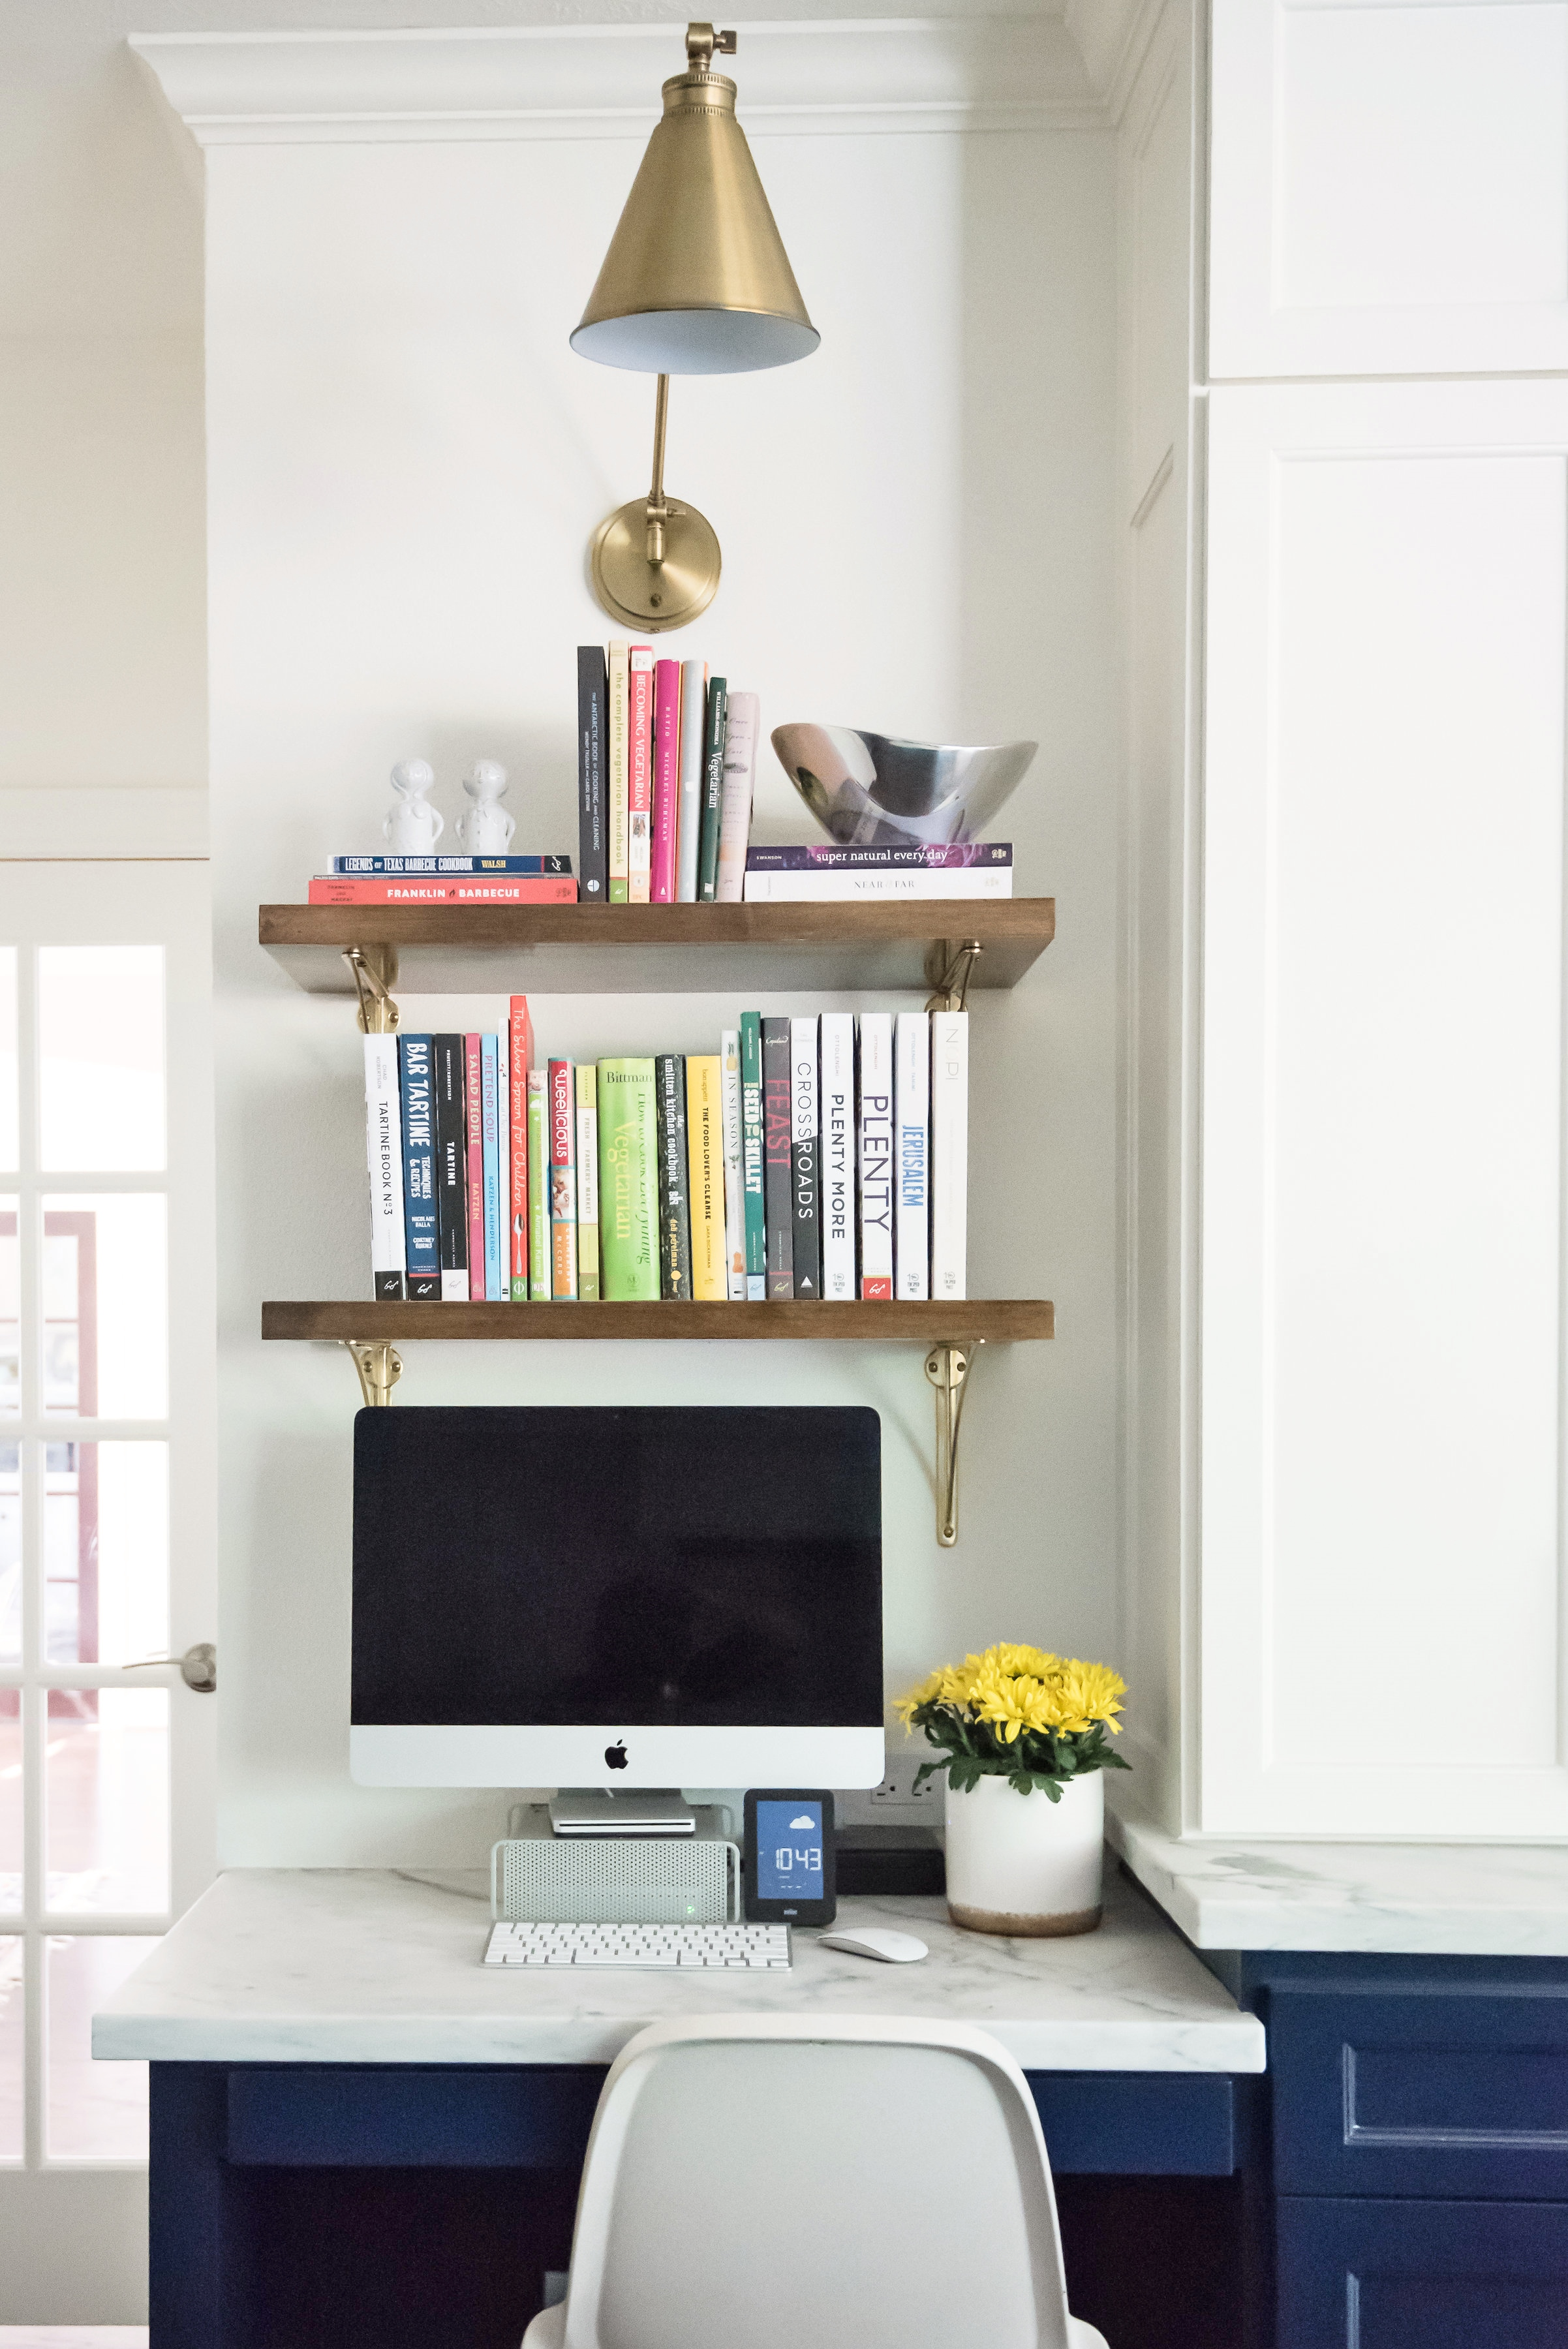 Desk in the kitchen with open shelving above - Carla Aston Designer, Lauren Giles Photographer